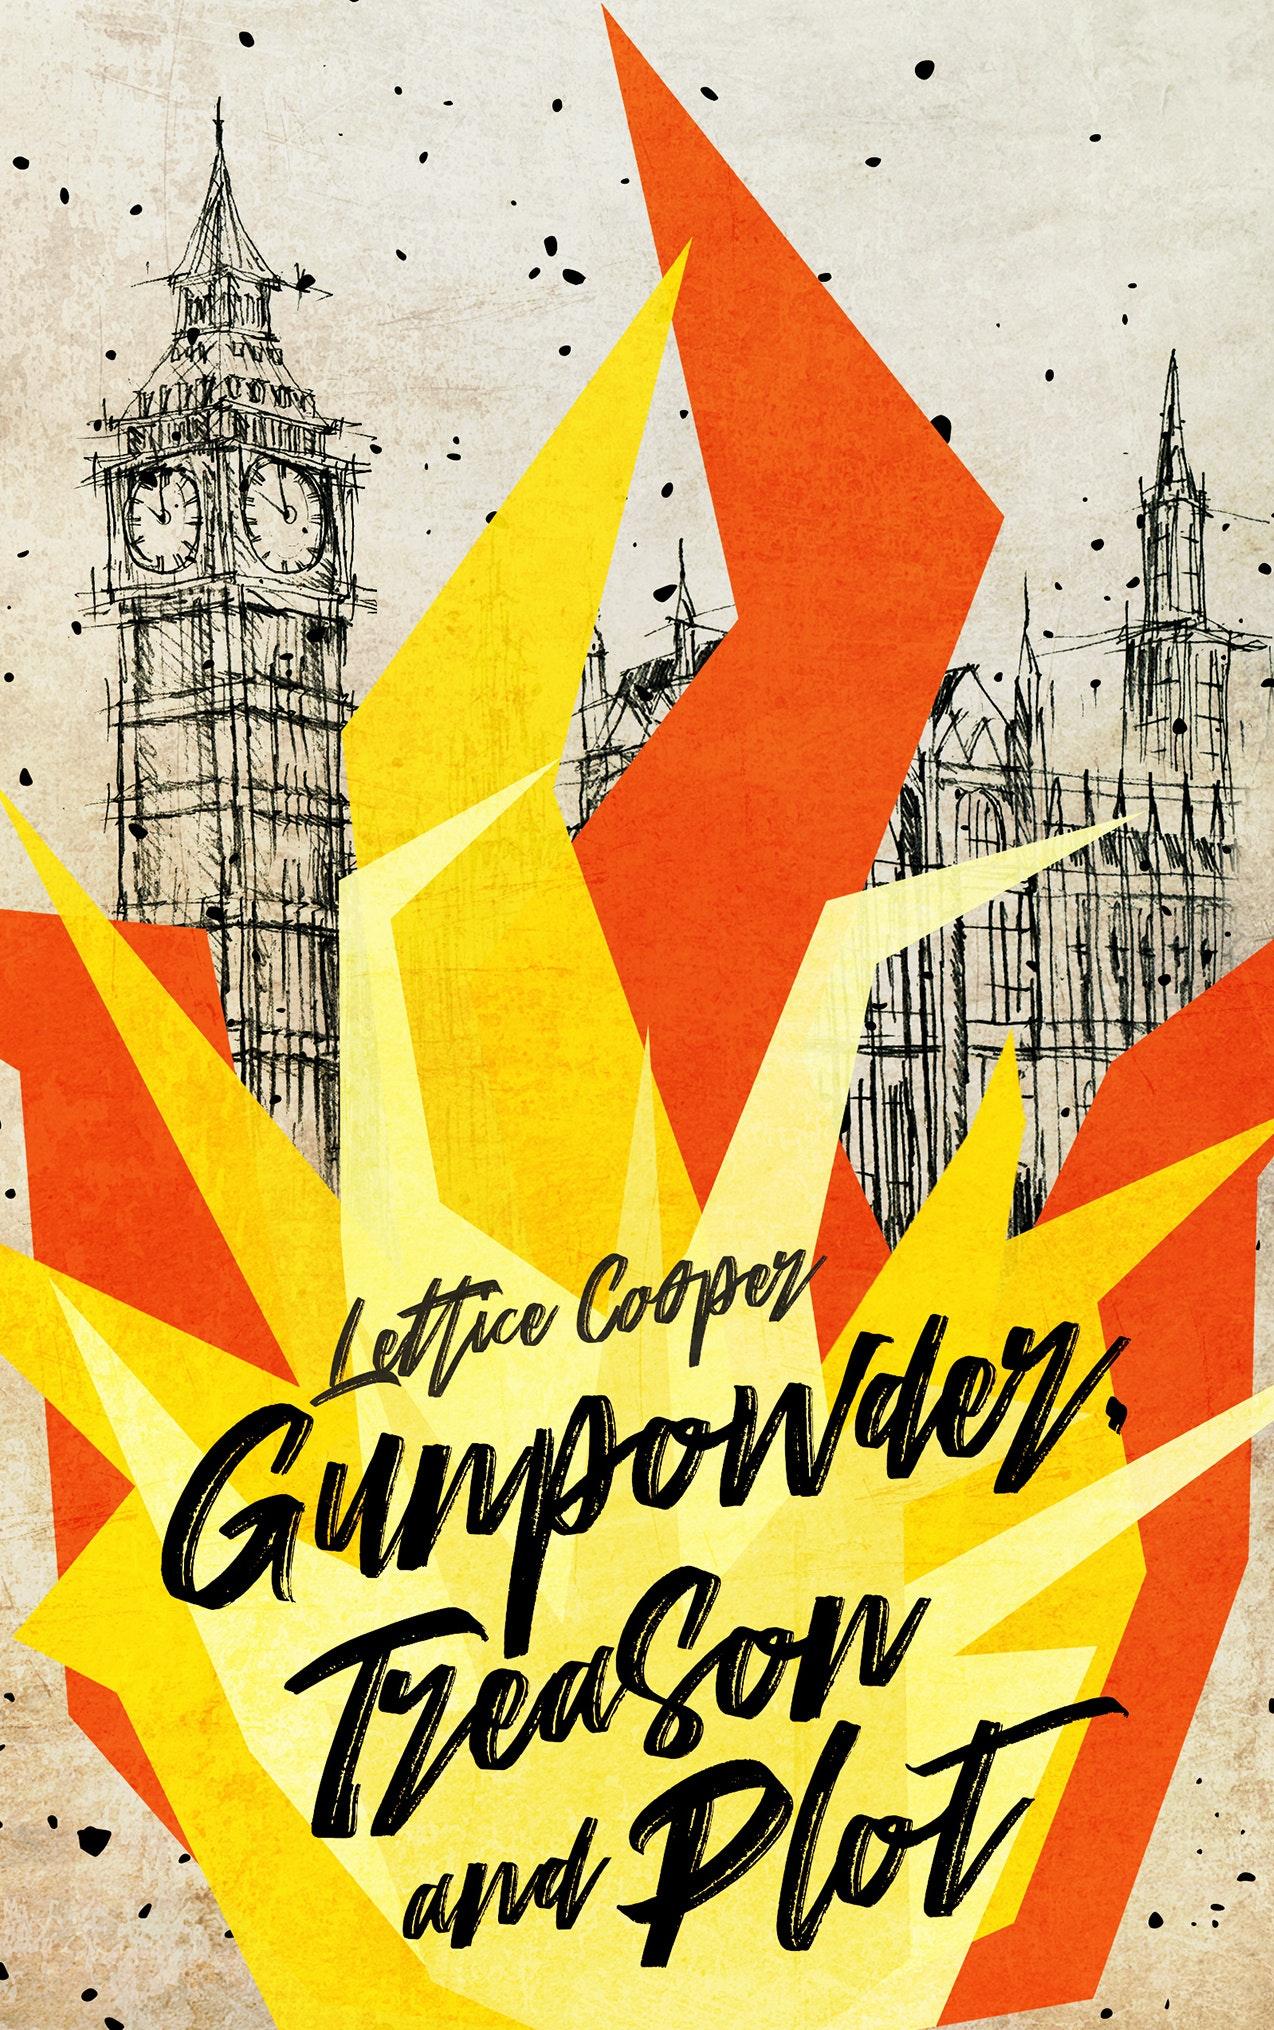 Gunpowder treason and plot book cover